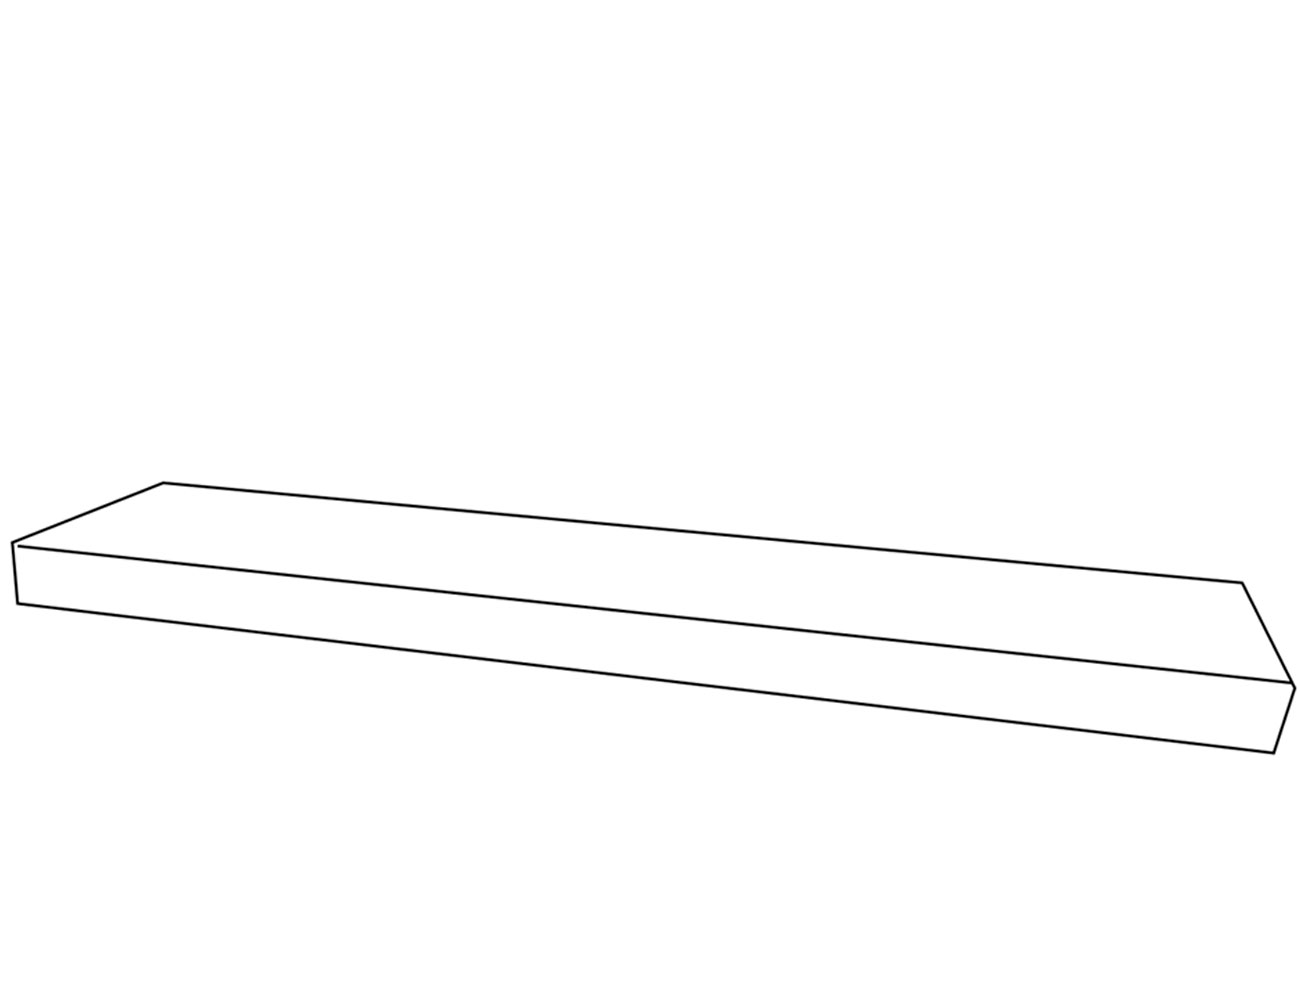 Estante con herrajes 160x8x25 cm